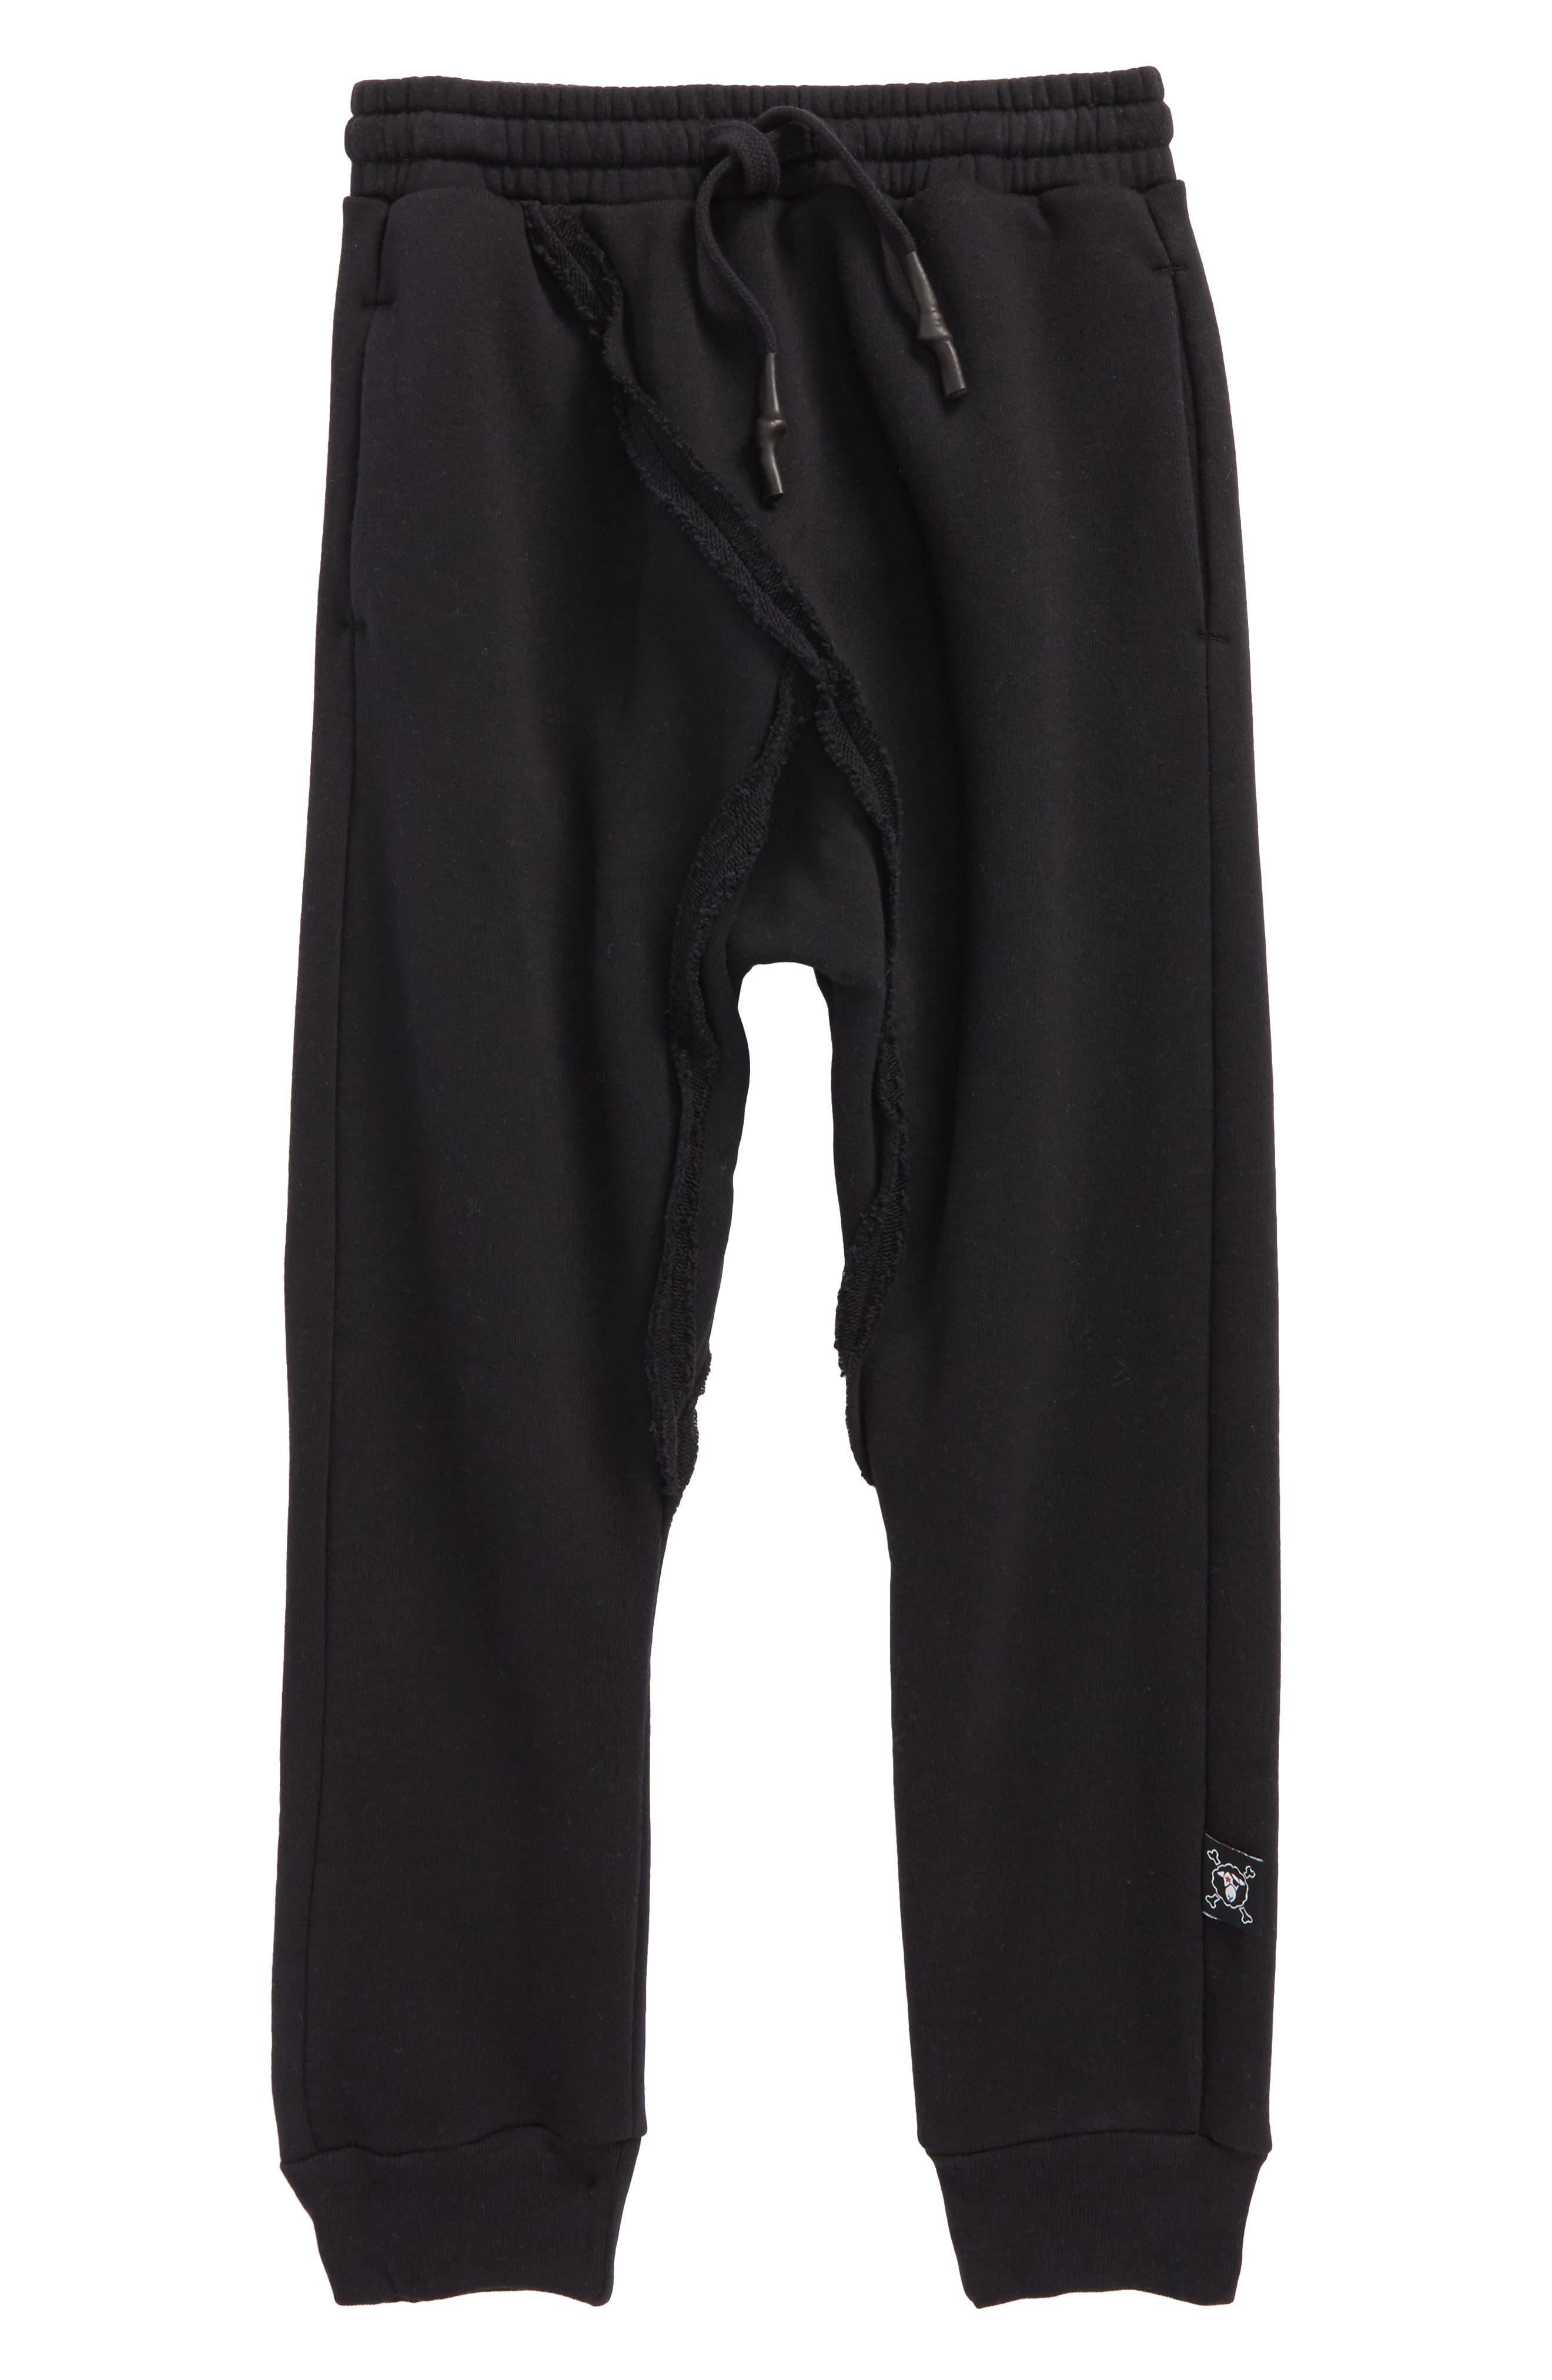 Raw Baggy Pants,                         Main,                         color, 001